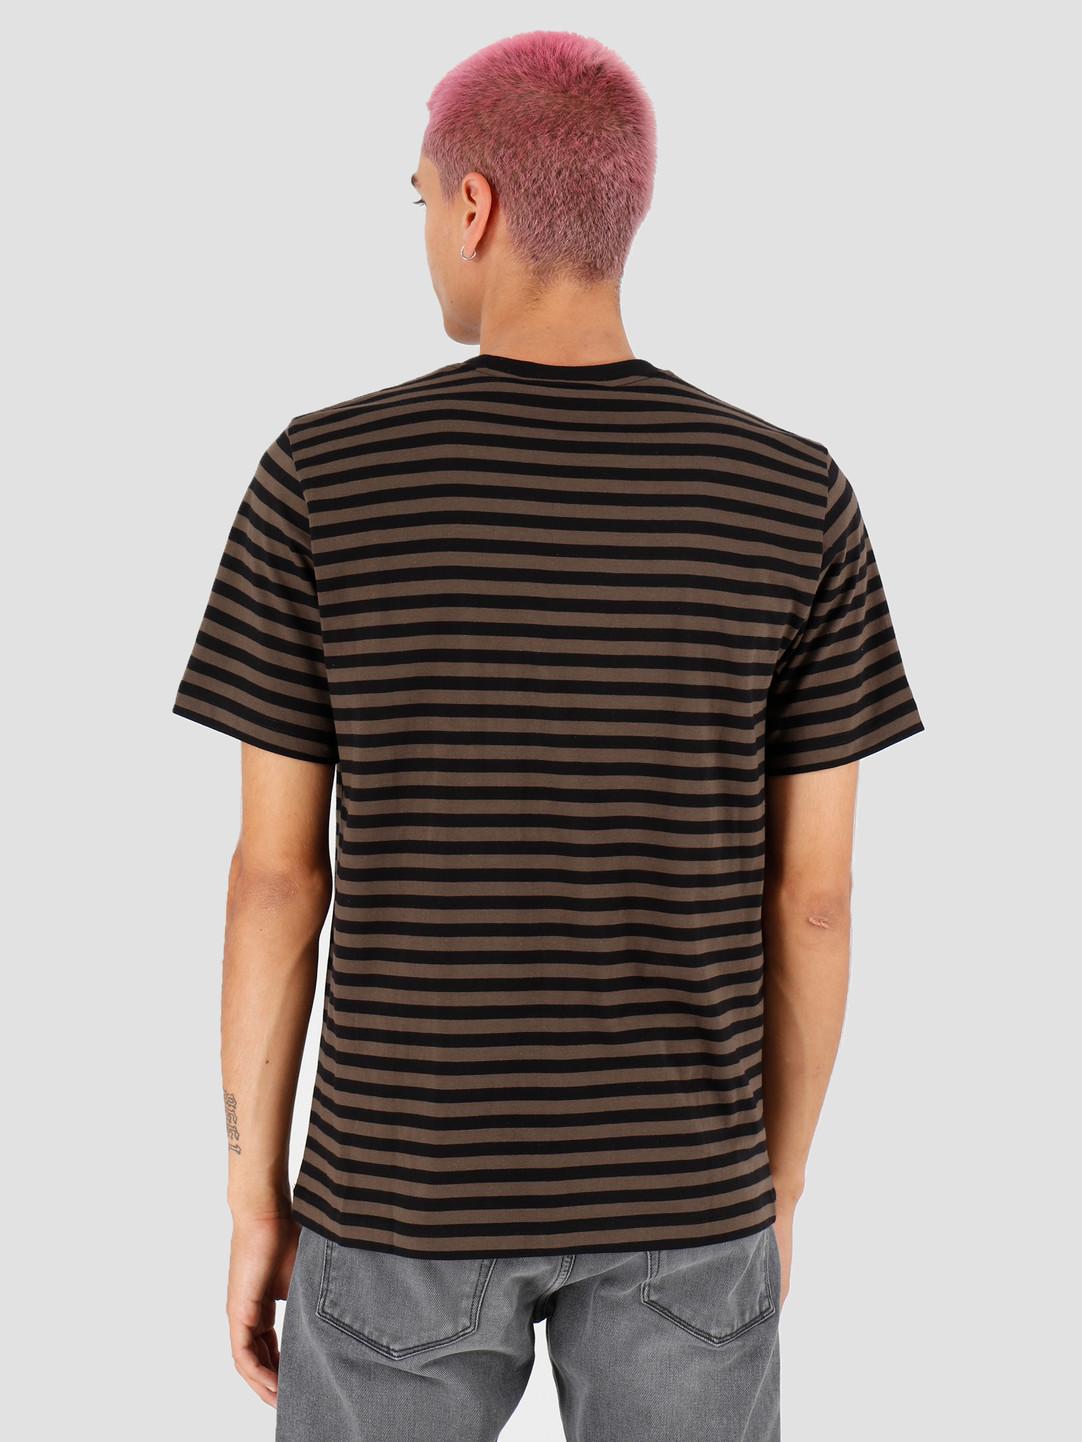 Carhartt WIP Carhartt WIP Haldon Pocket T Shirt Haldon Stripe Black Cypress I027066